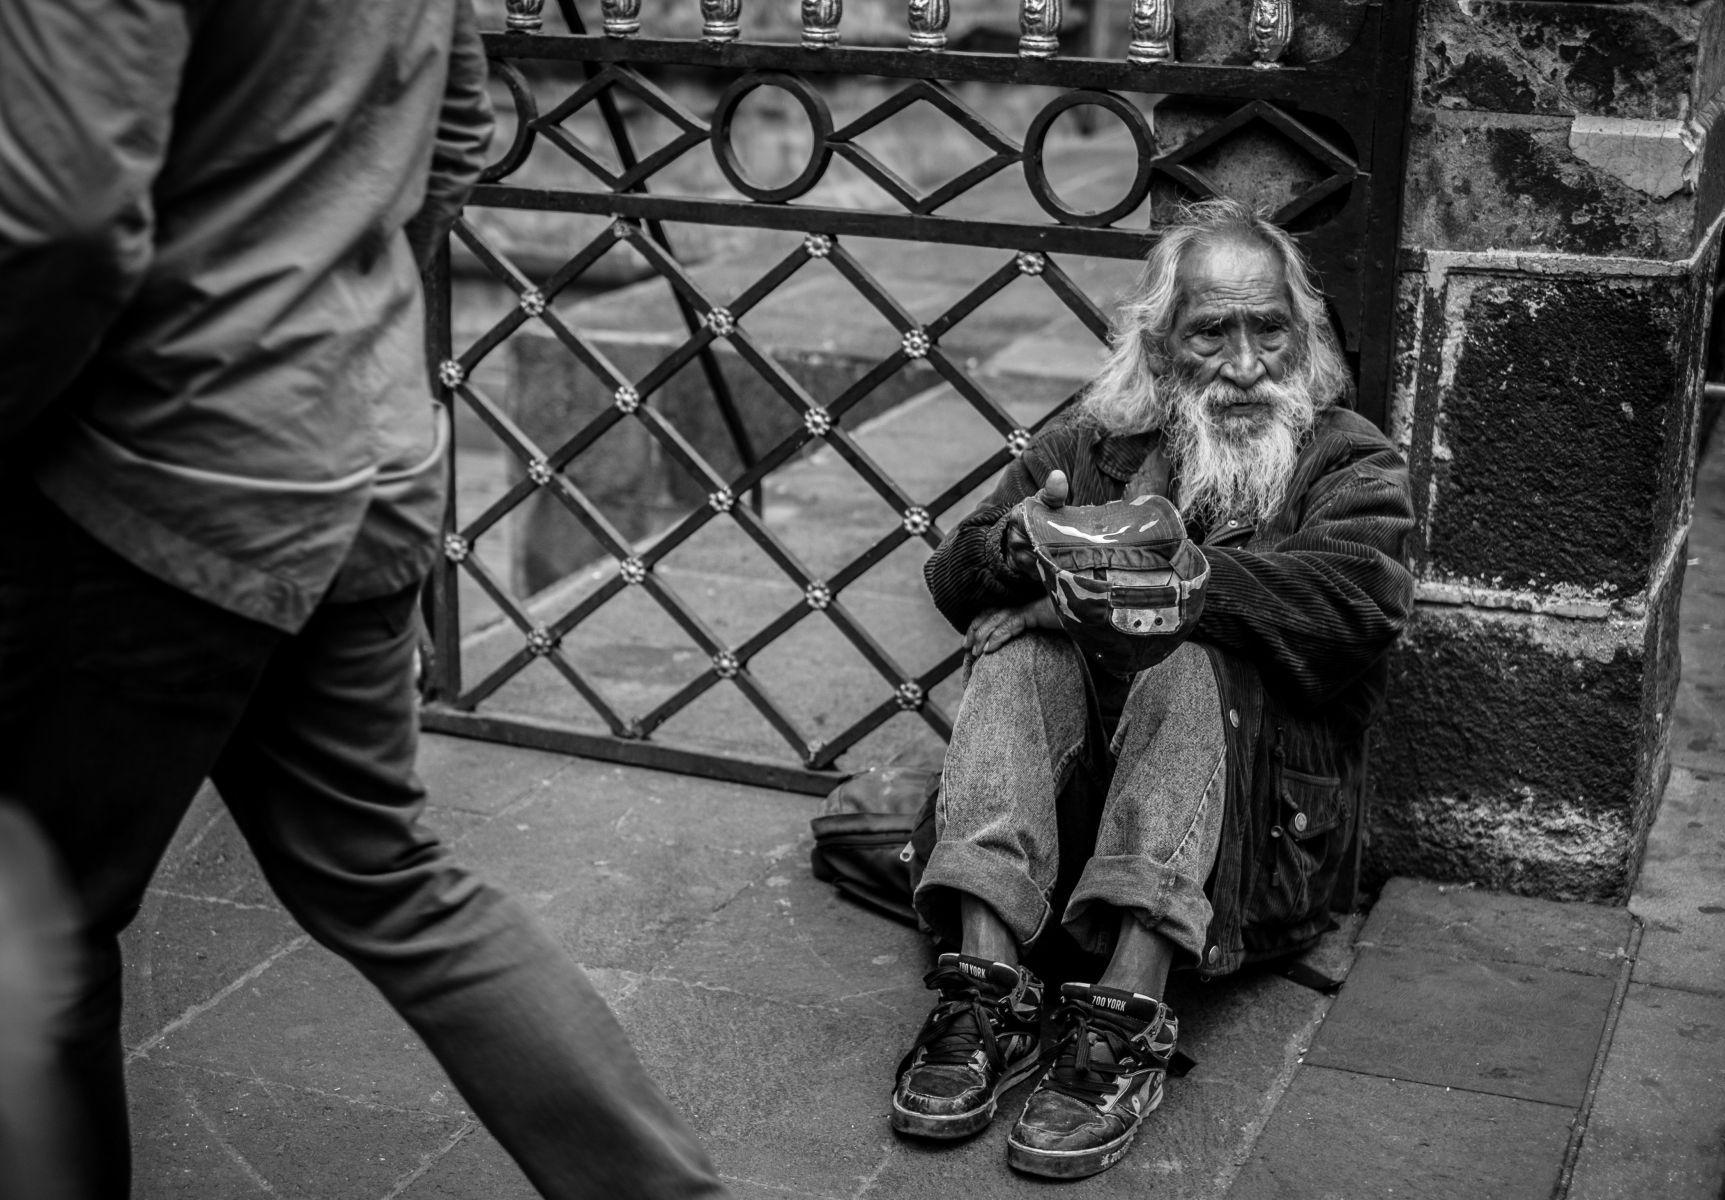 1old_man_begging_mexico_city_2015_1.jpg